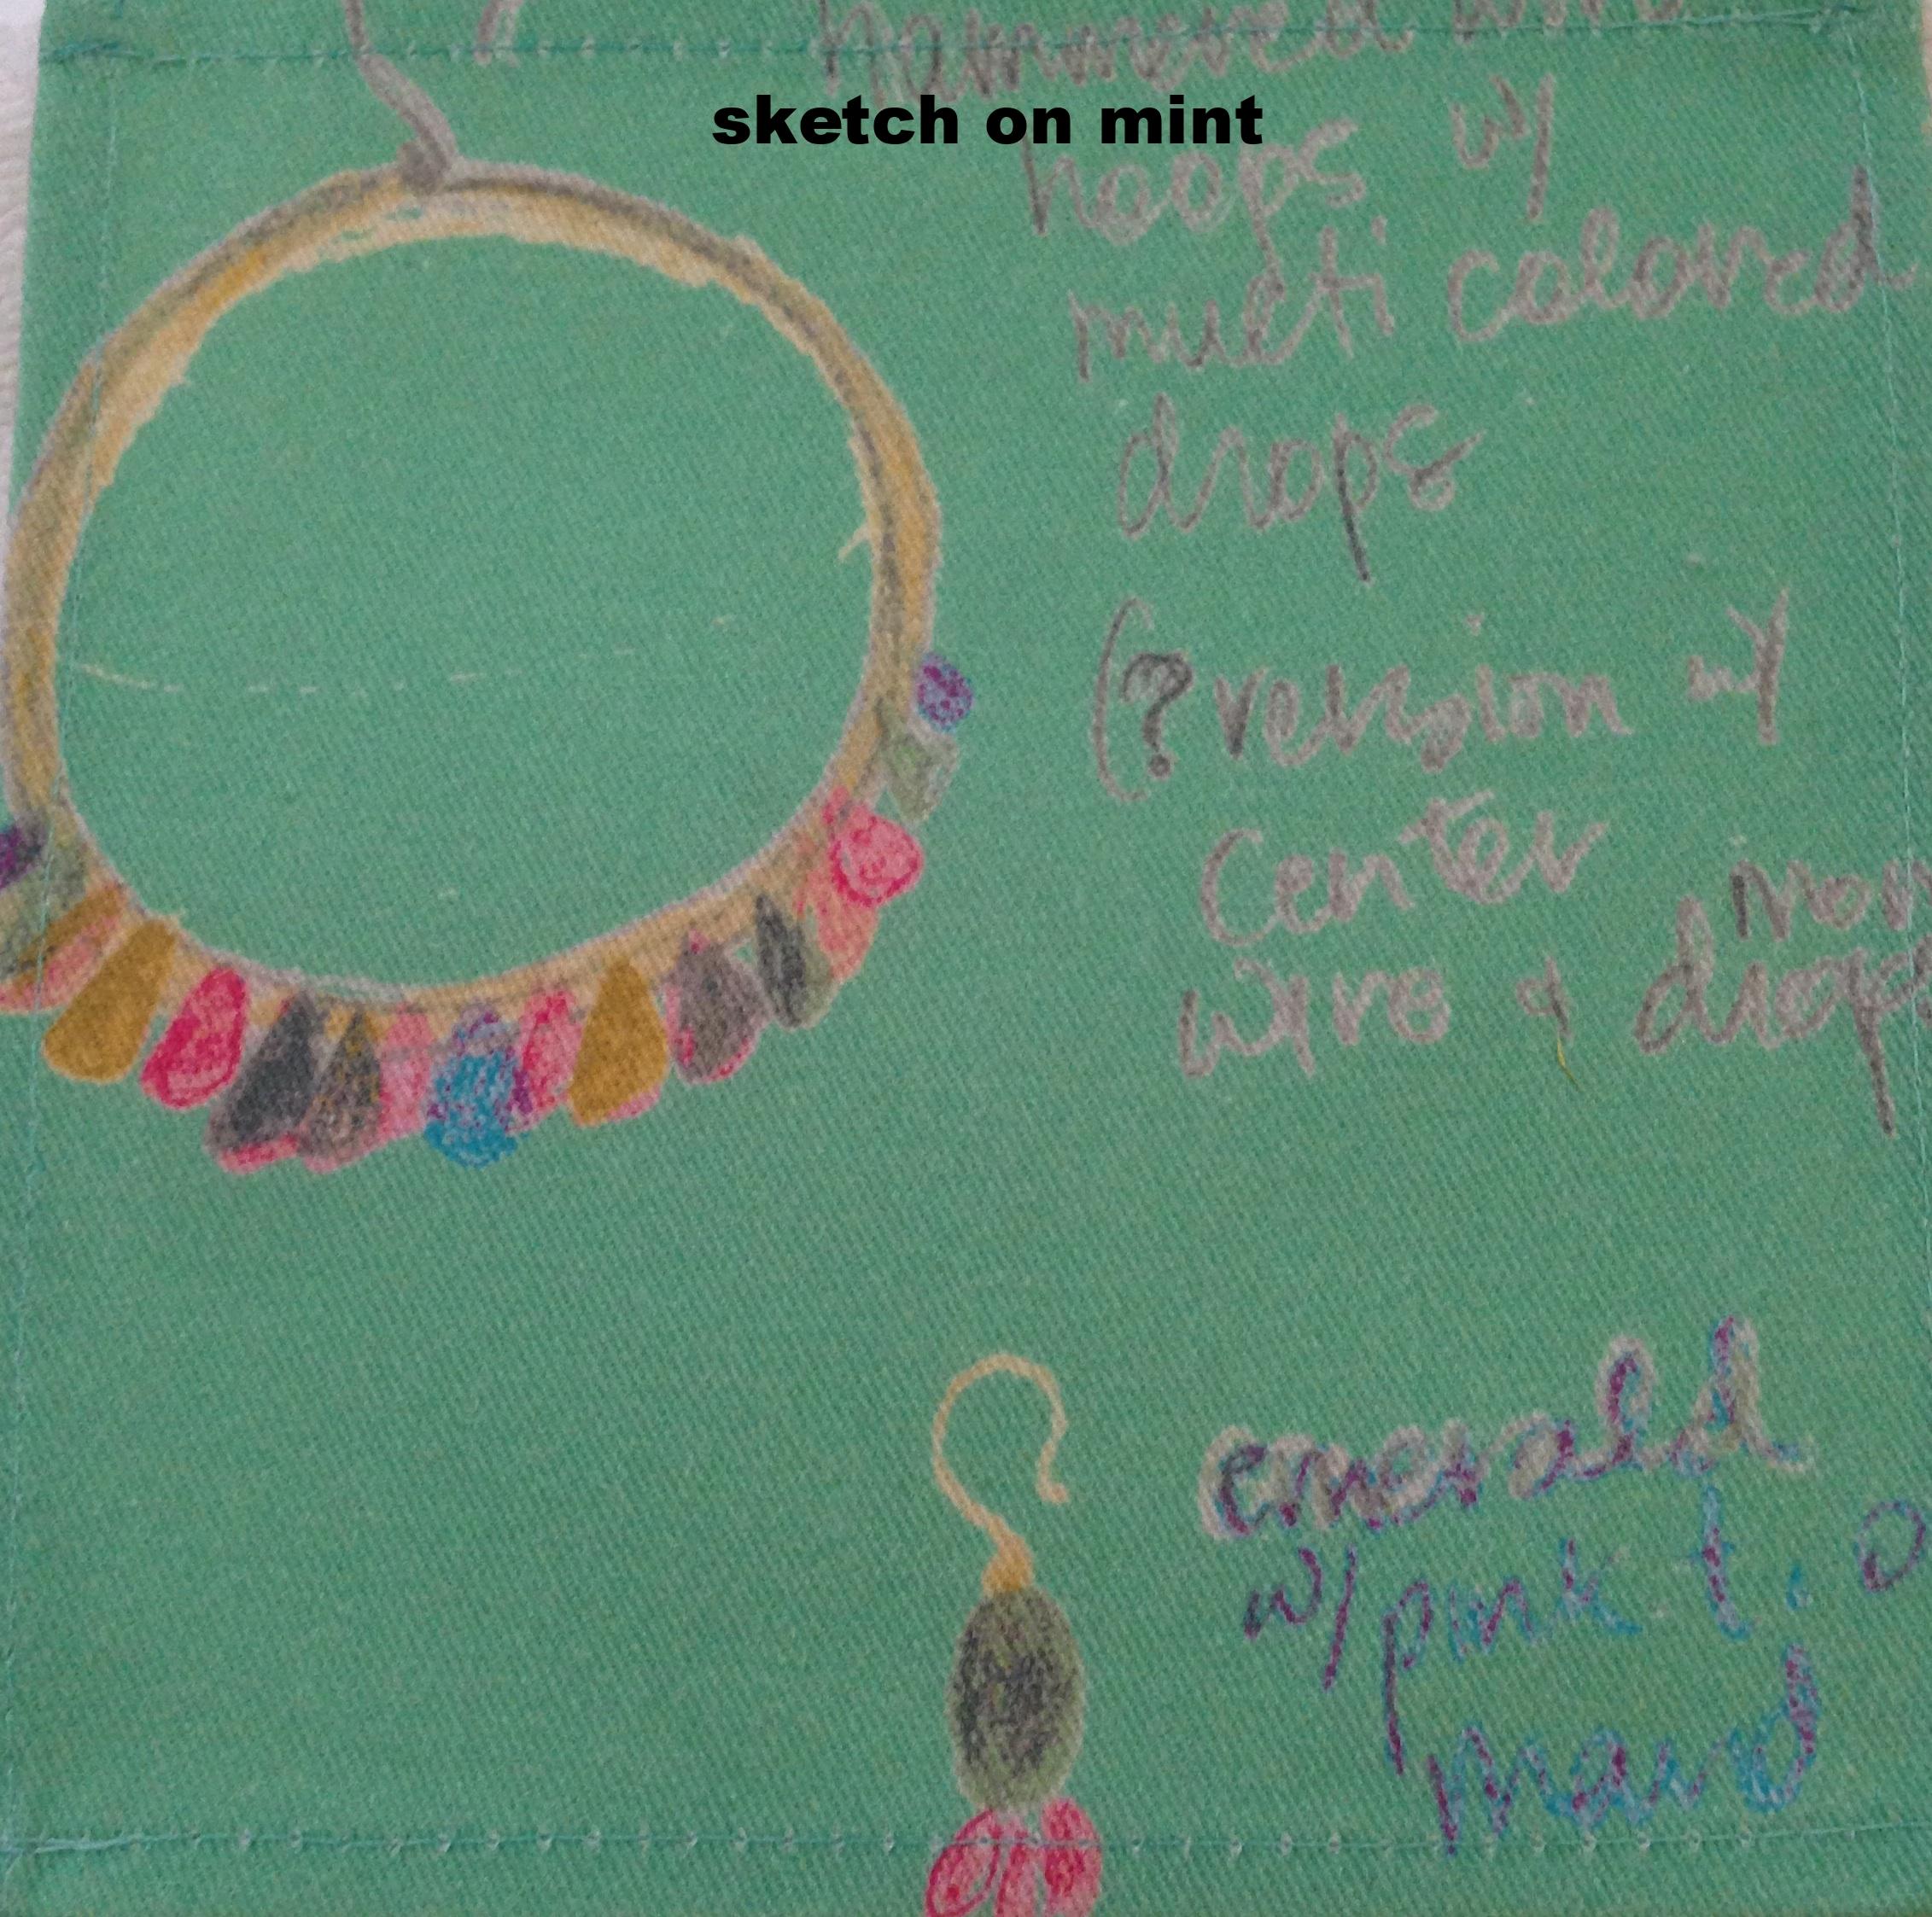 sketch on mint